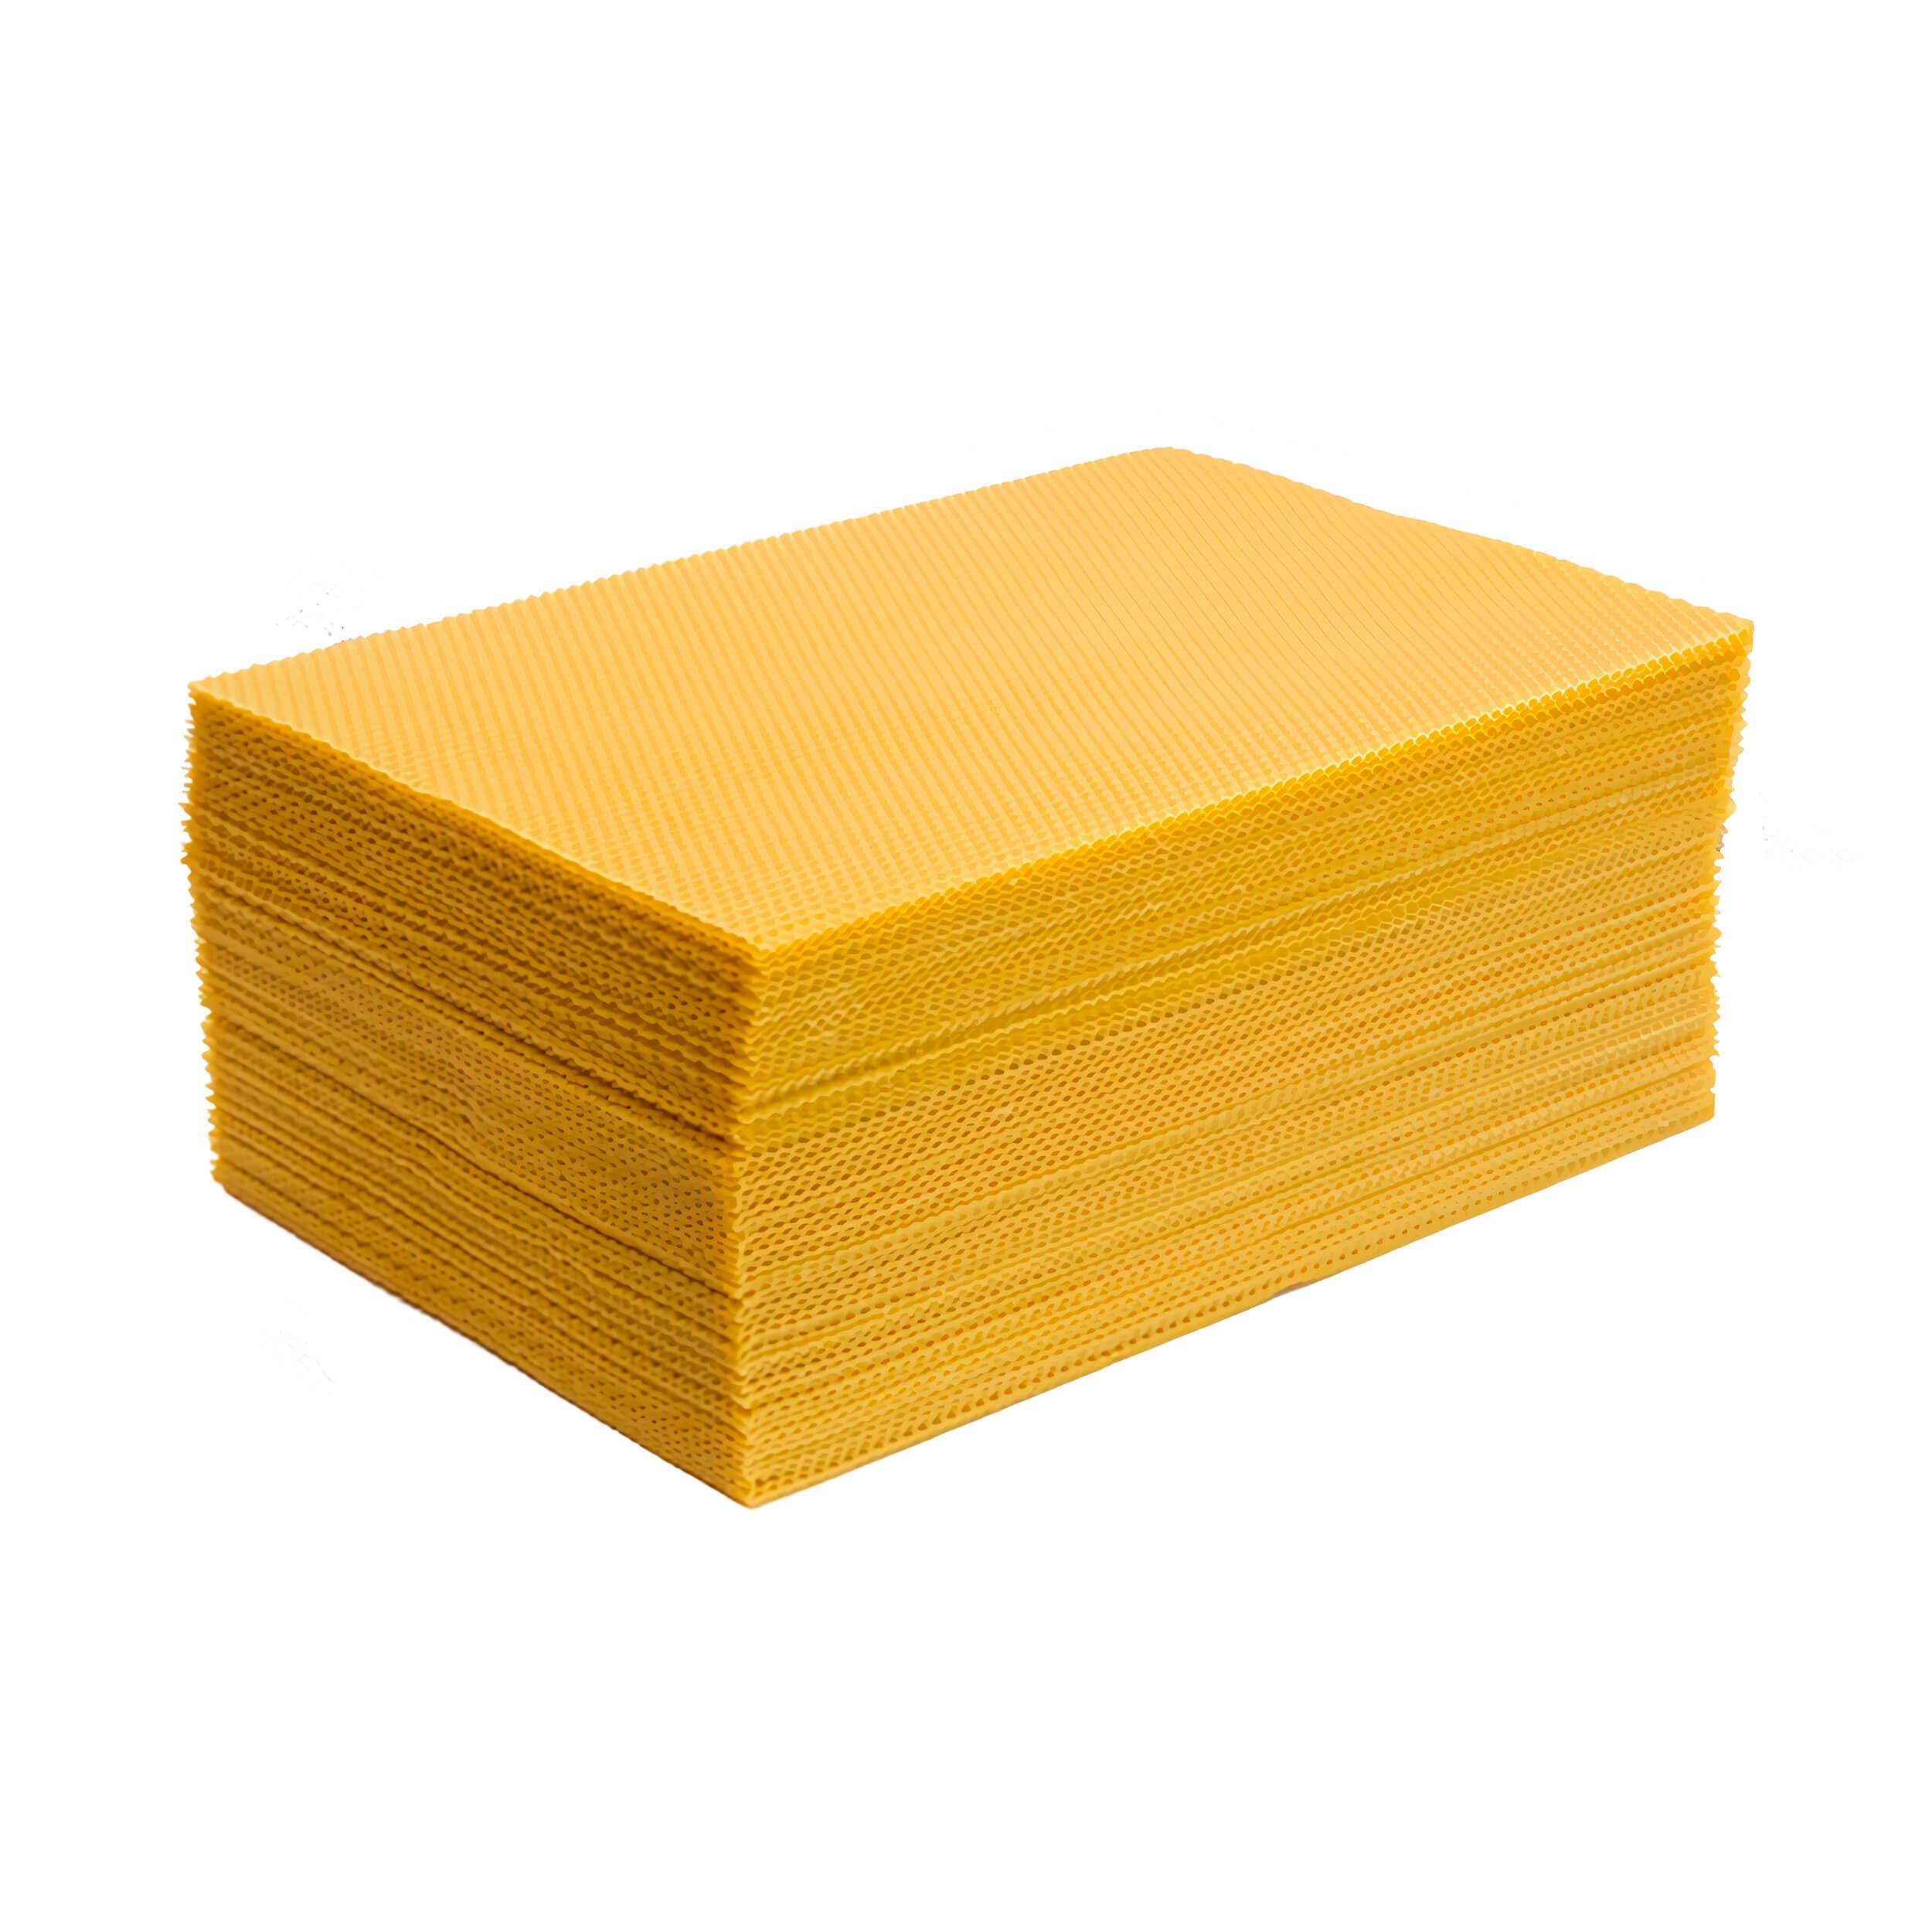 "Вощина ""Русское пчеловодство"" (Дадан, максимум, пачка 1 кг) фото"